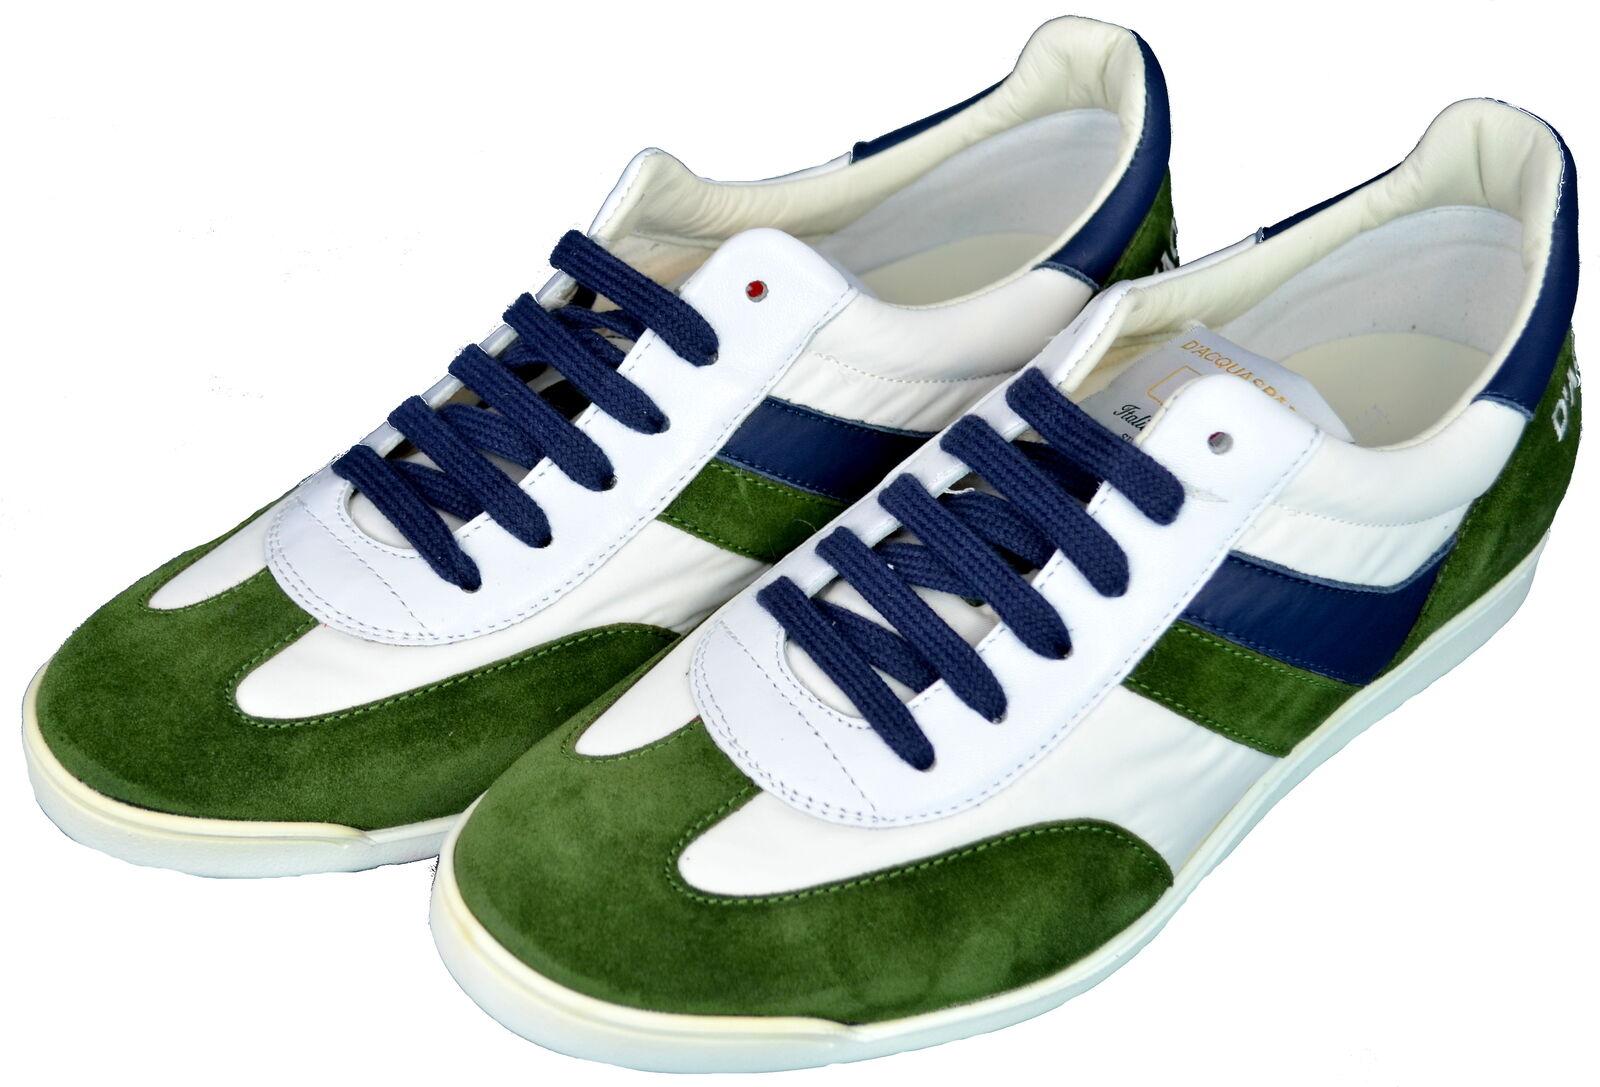 D'acquasparta Vasari Scarpe Sneakers Uomo Men  Vasari D'acquasparta T.70 WGE  White/Green 6066e2